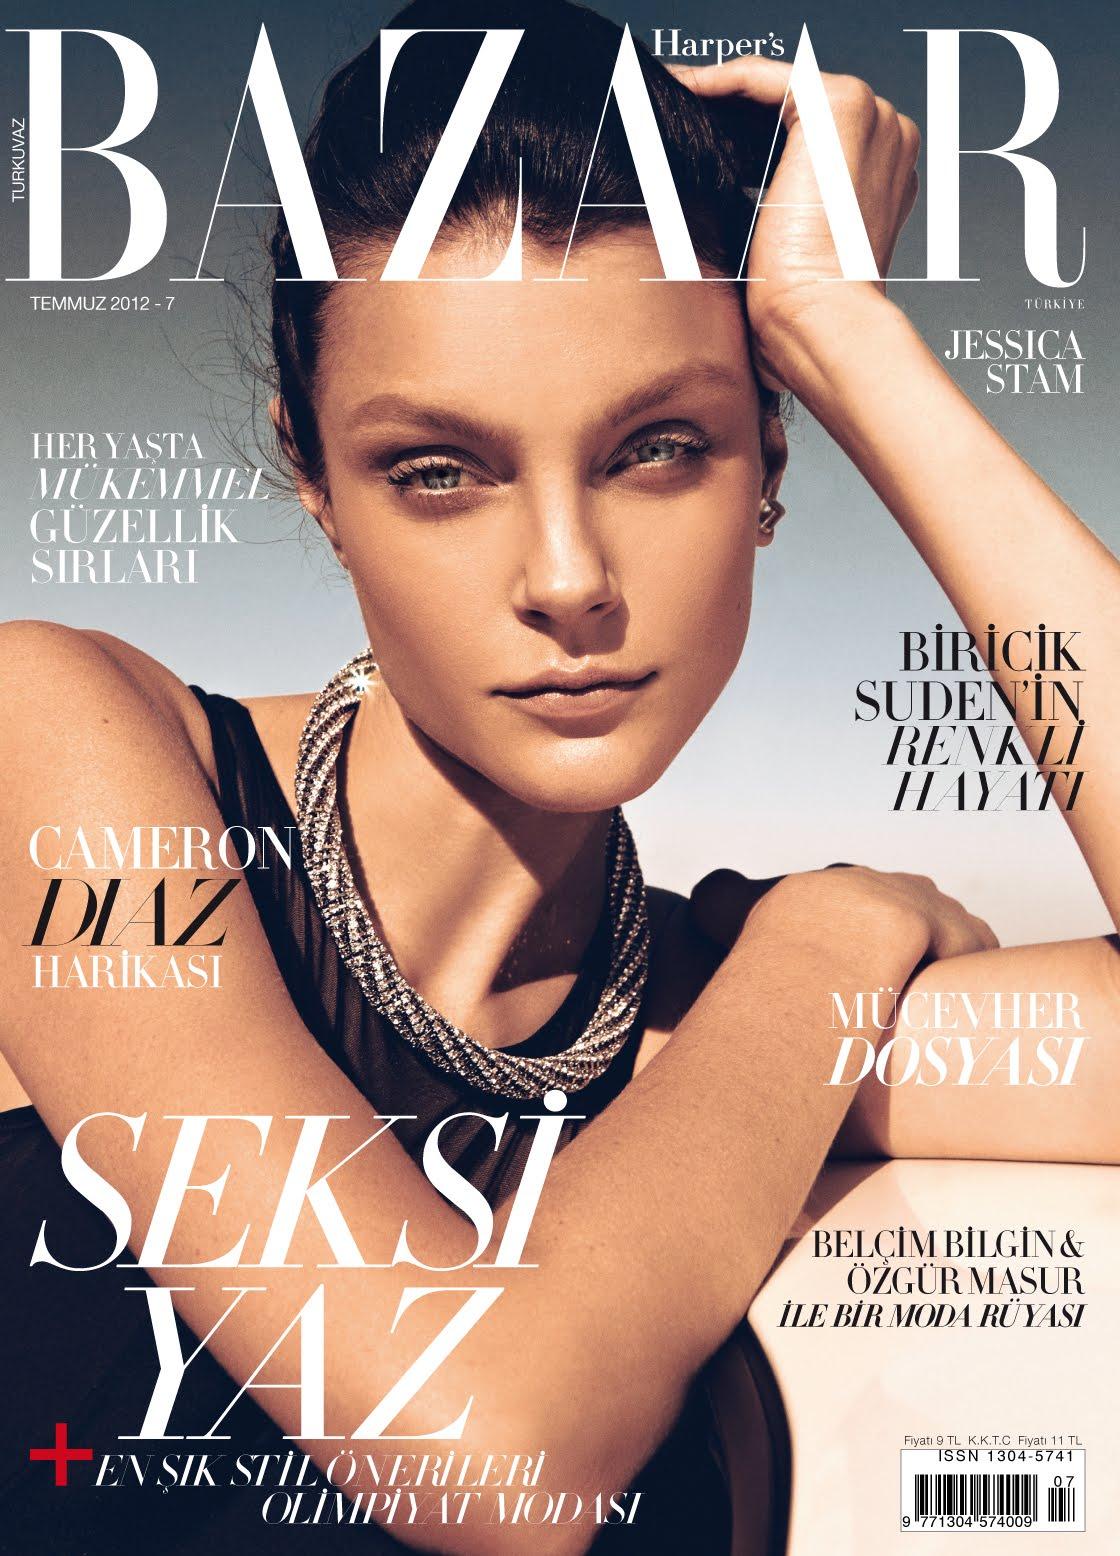 Джессика Стэм на обложке журнала Harpers Bazaar